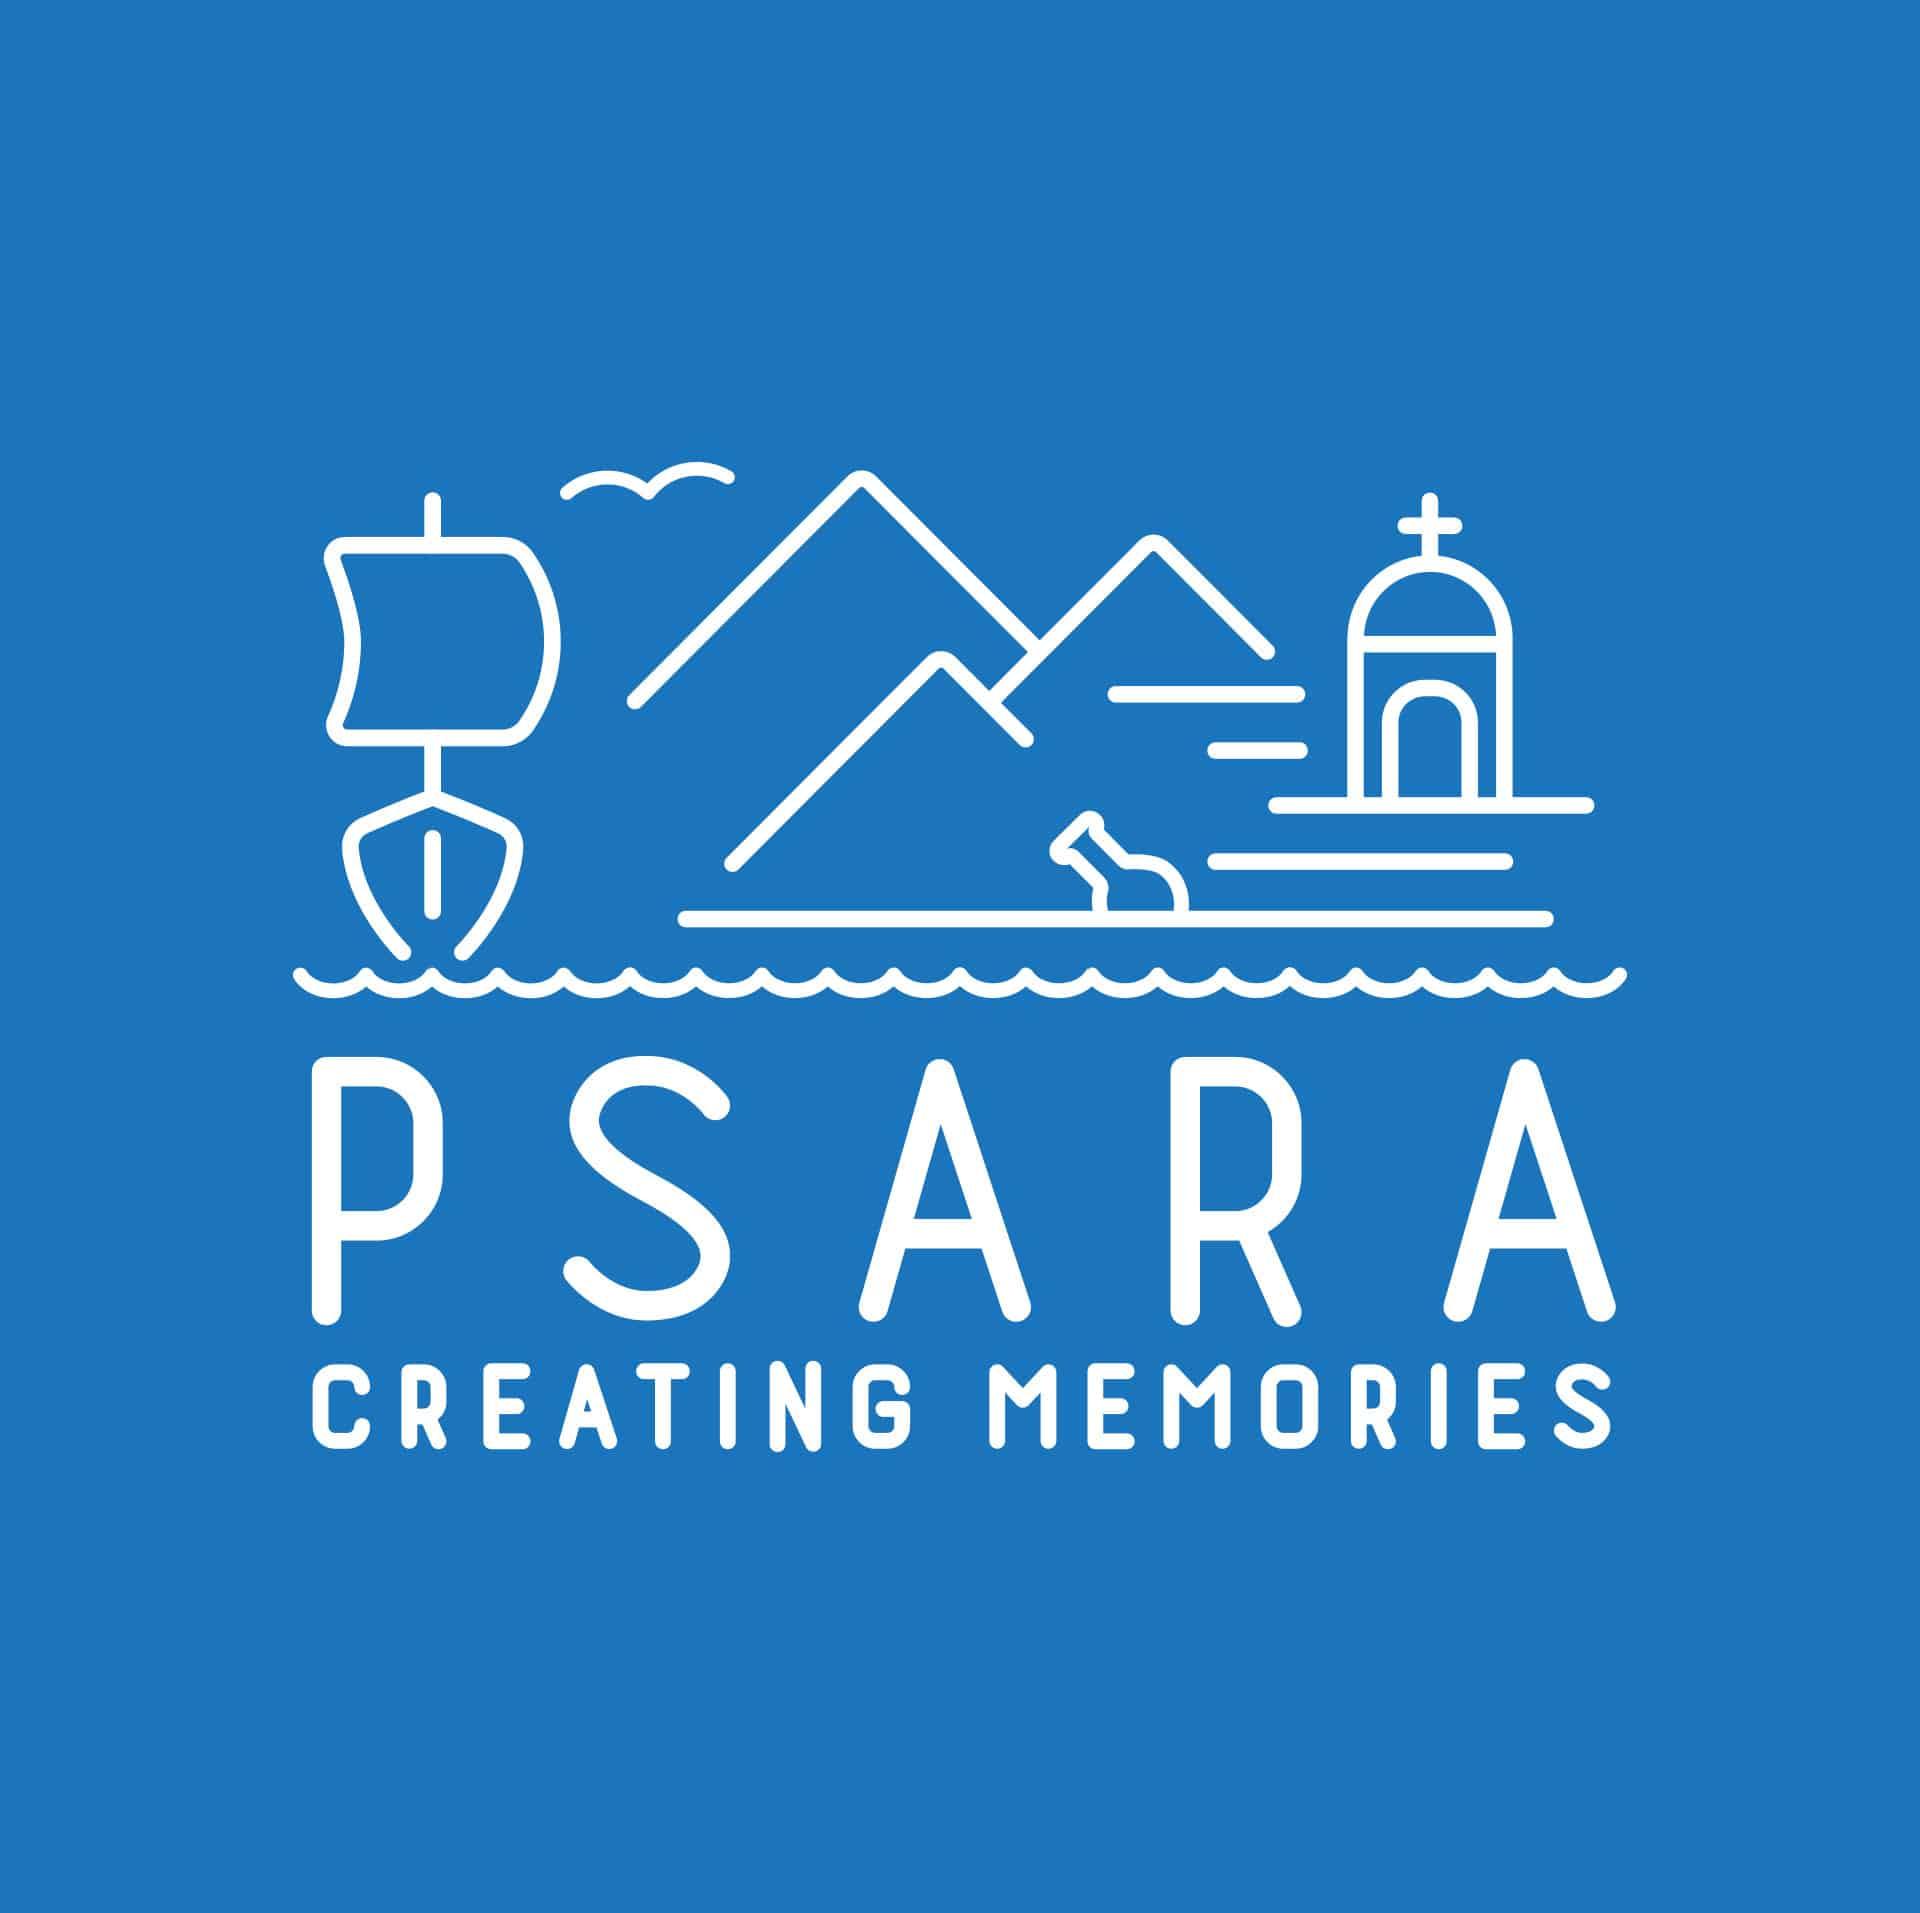 PROPAGANDA - psara logo blue